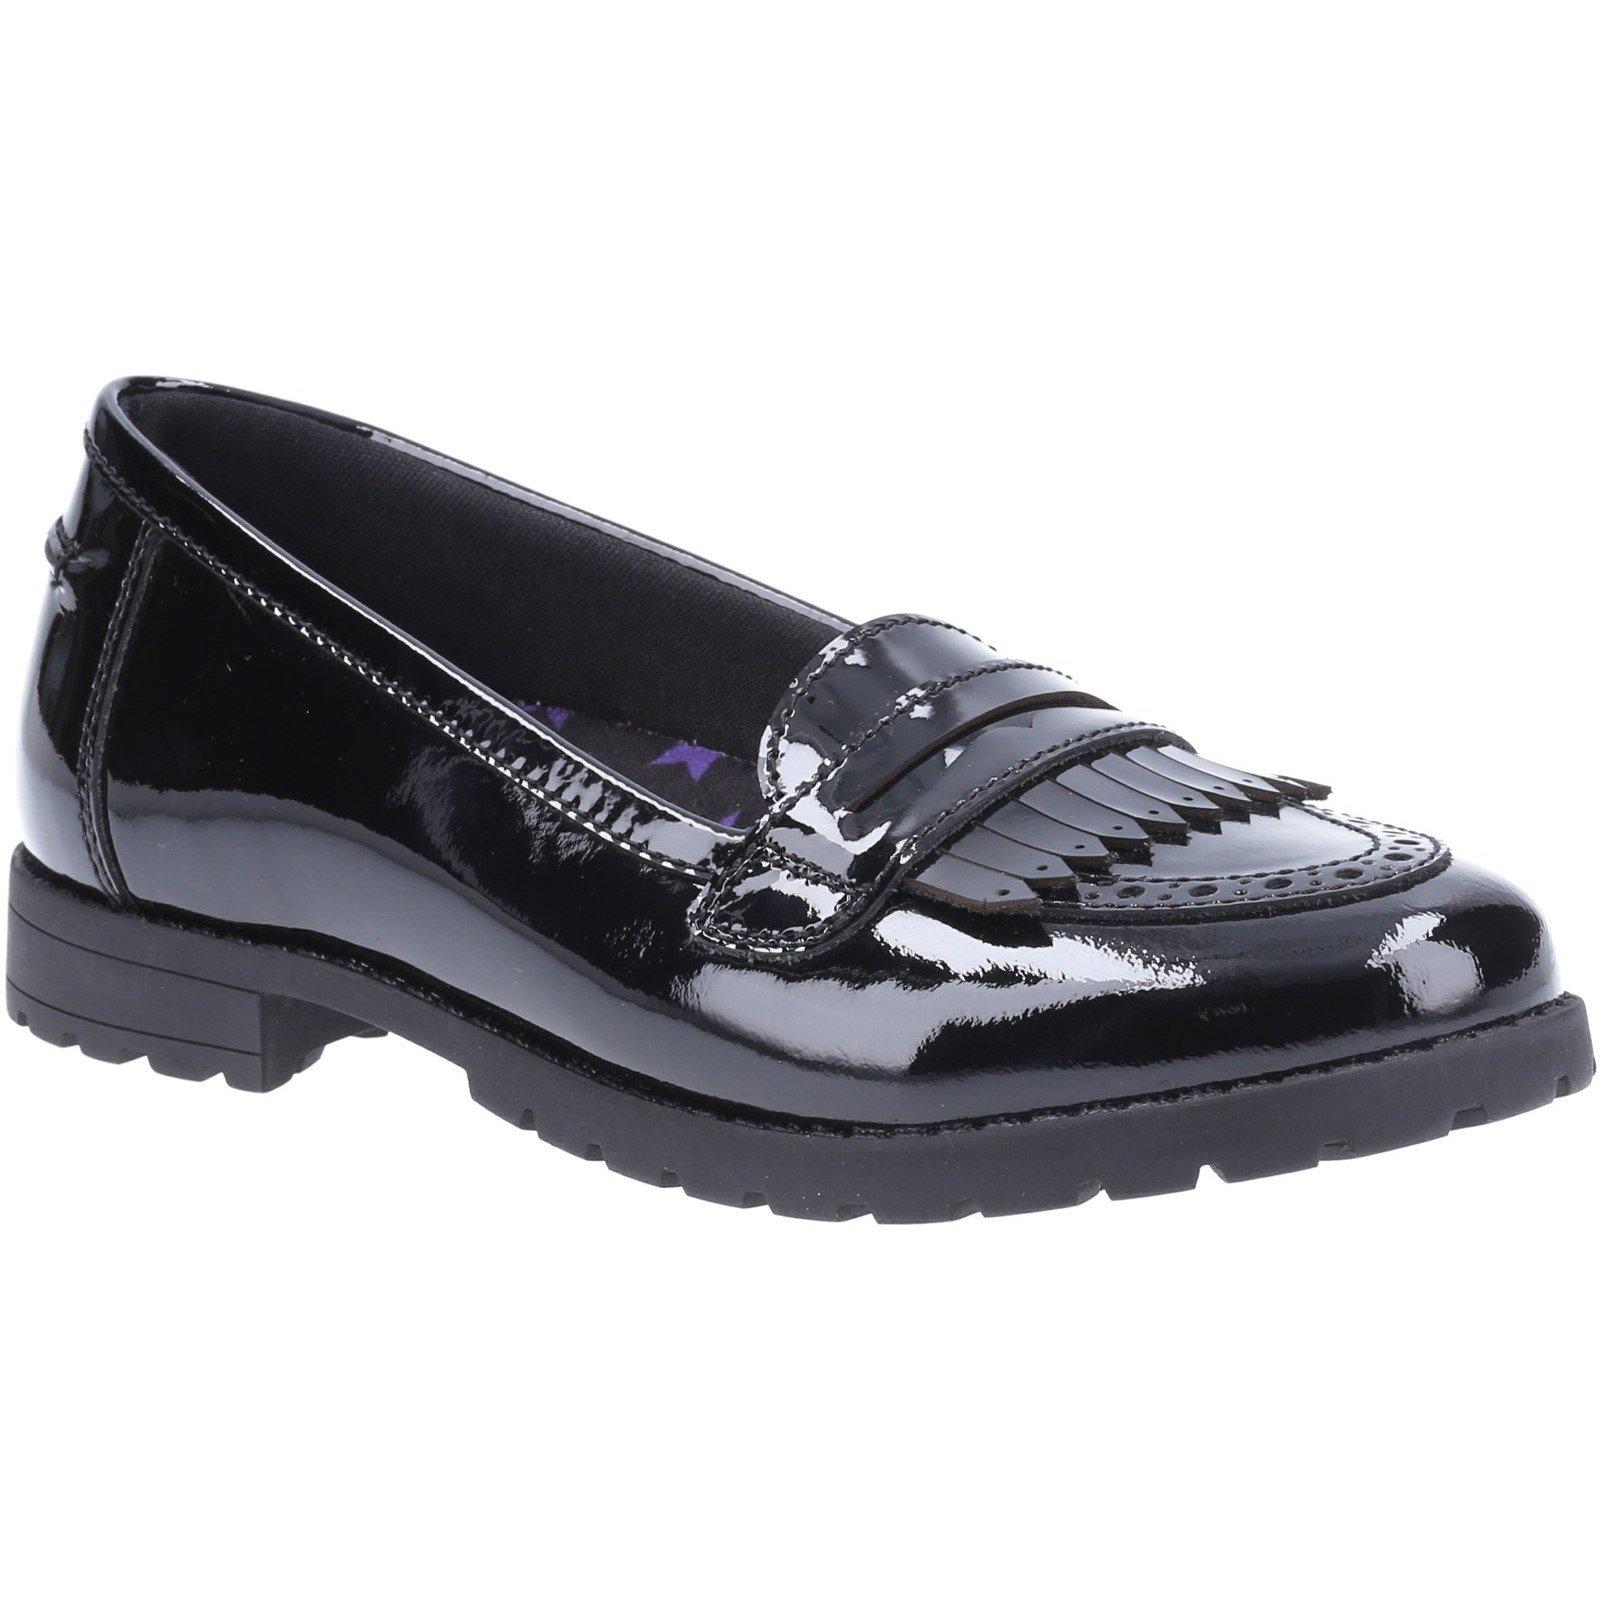 Hush Puppies Kid's Emer Senior School Shoe Patent Black 32596 - Patent Black 7